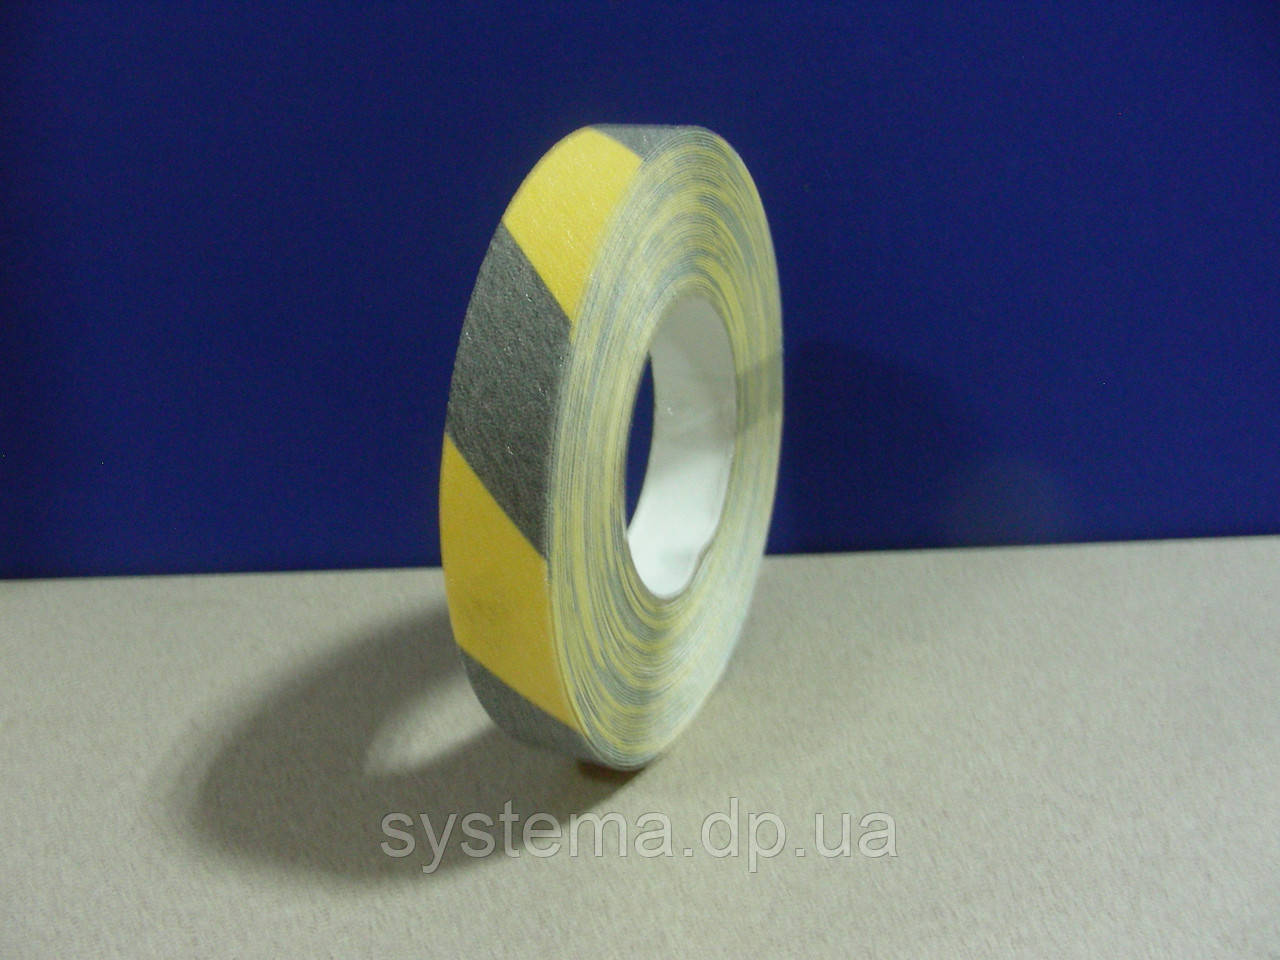 Антискользящая, самоклеющаяся лента, черно-желтая, 25 мм х 18 м (Бельгия)